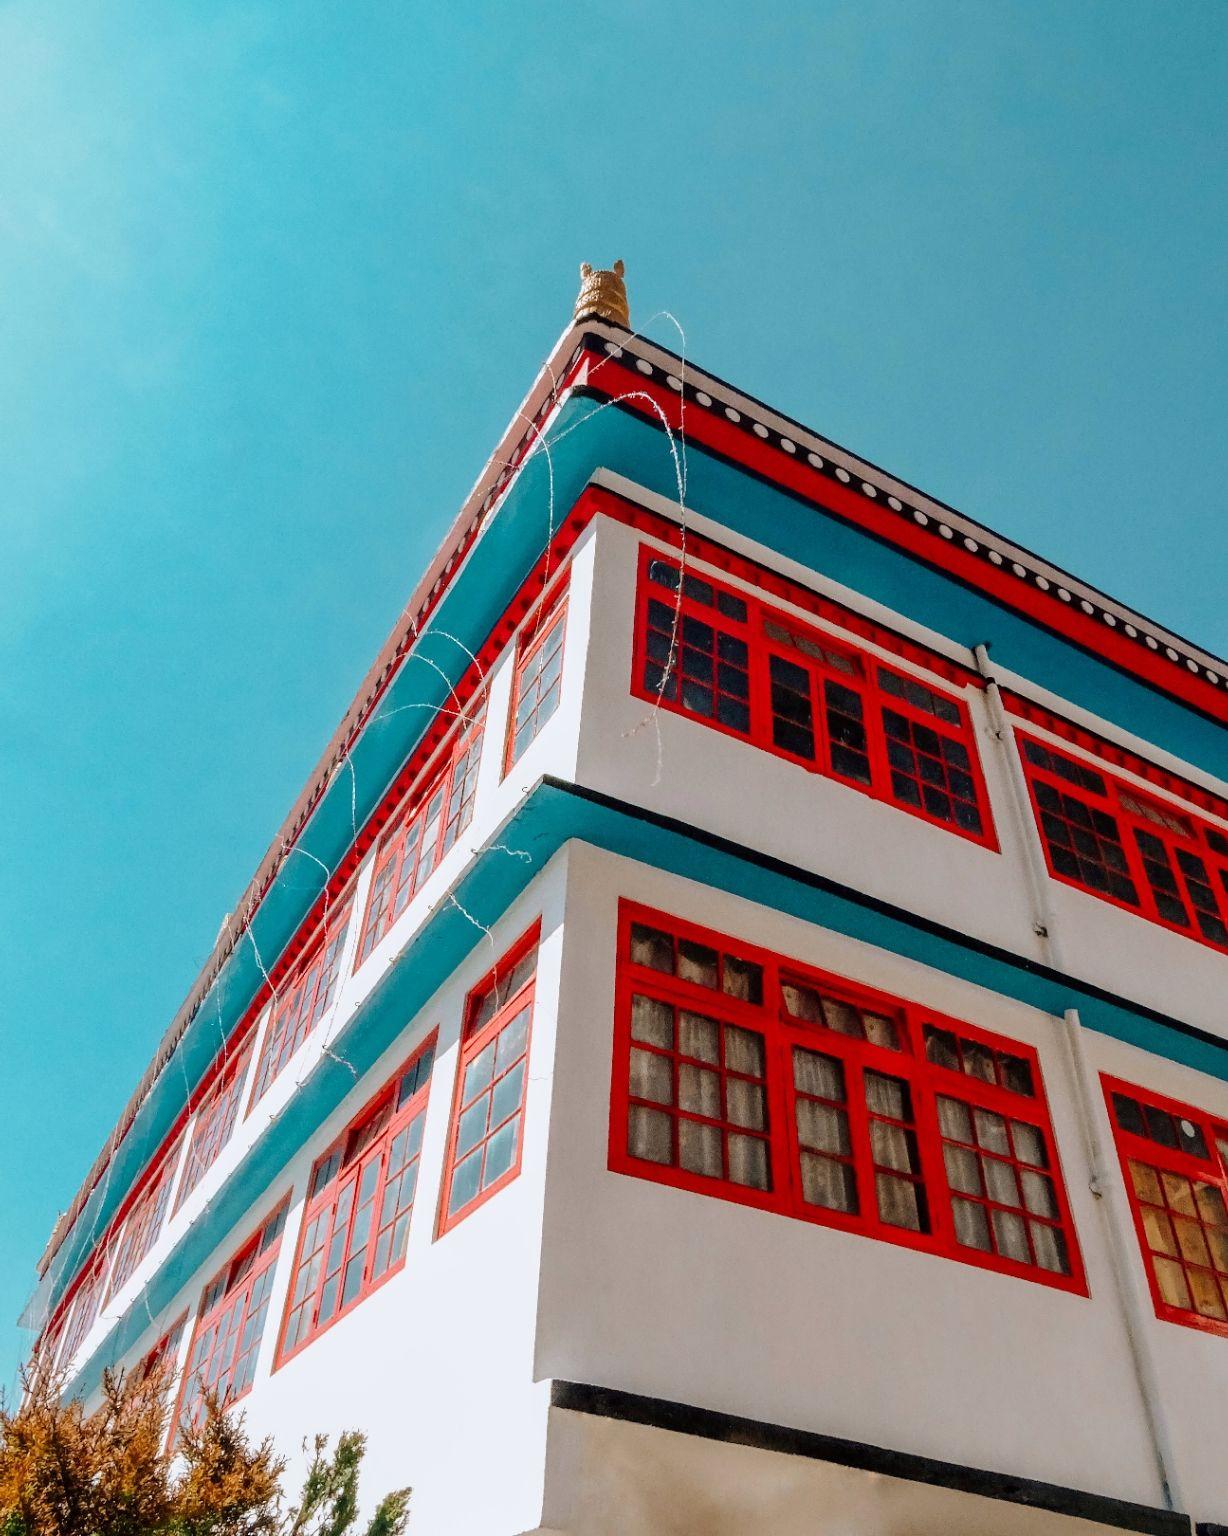 Photo of Dali Monastery By Himanshu Dutta